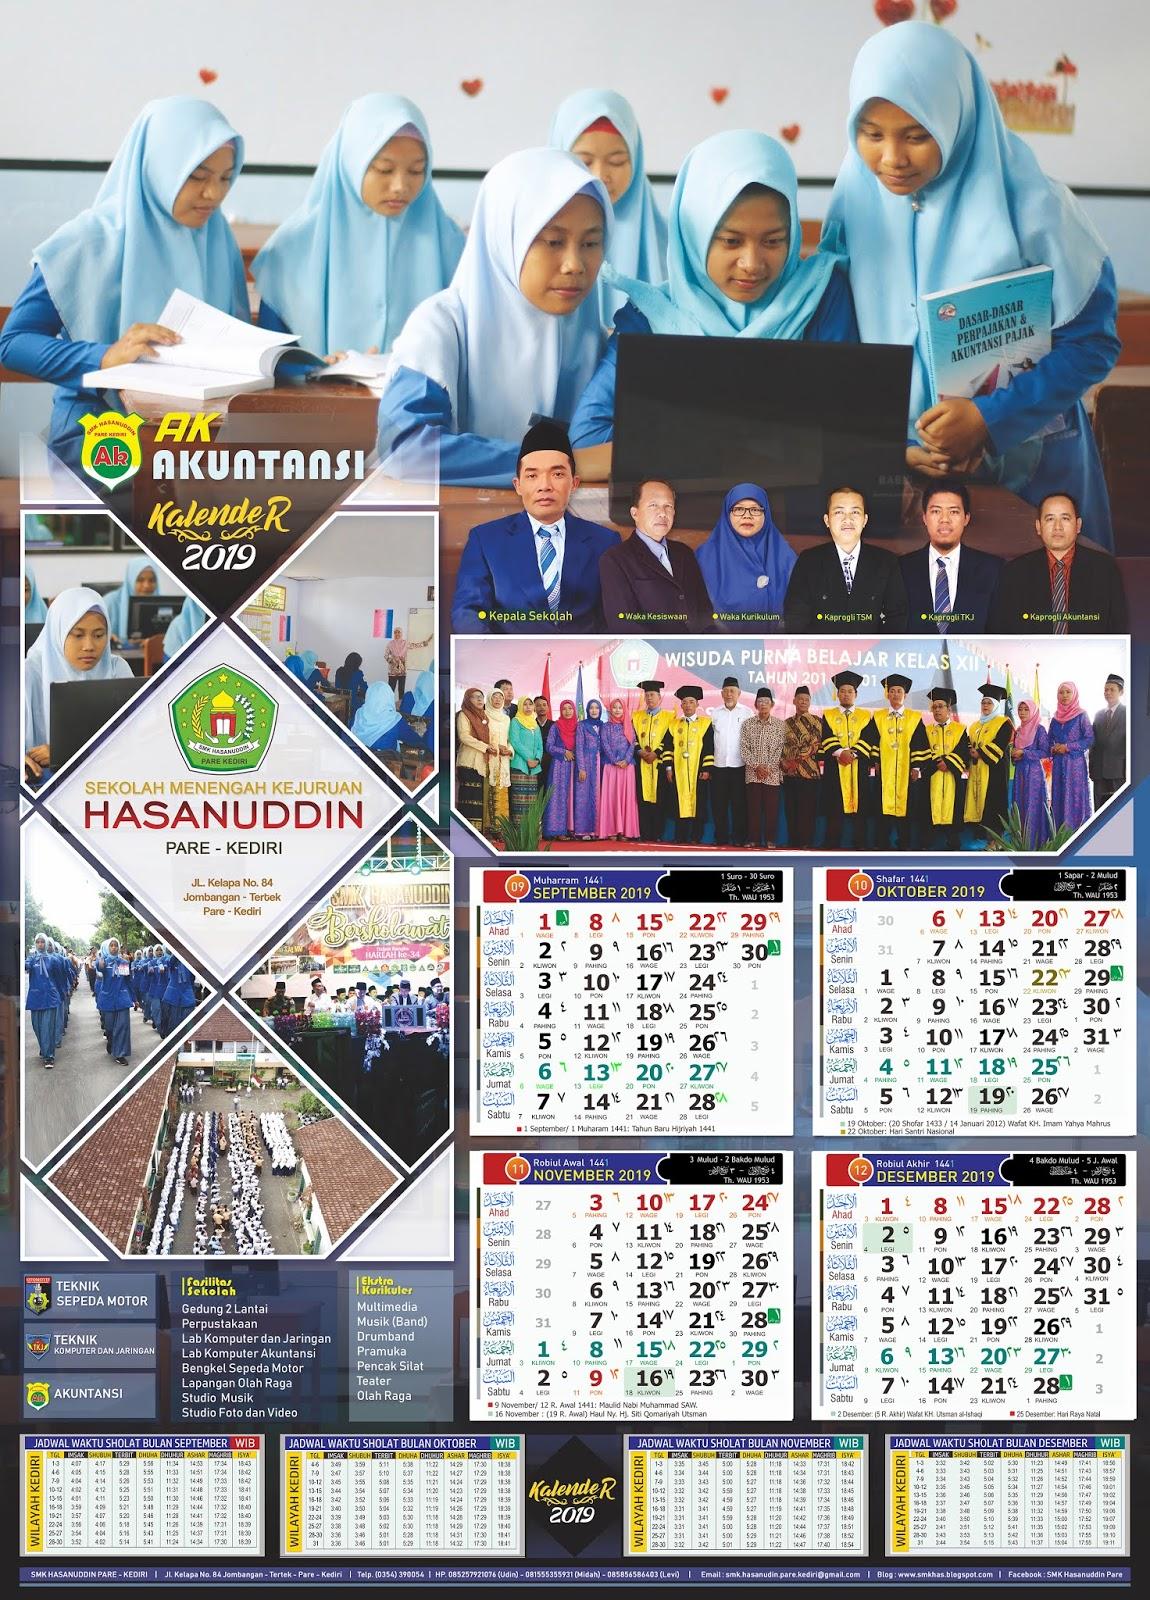 SMK Hasanuddin Pare Kediri: Desain Kalender 2019 SMK ...